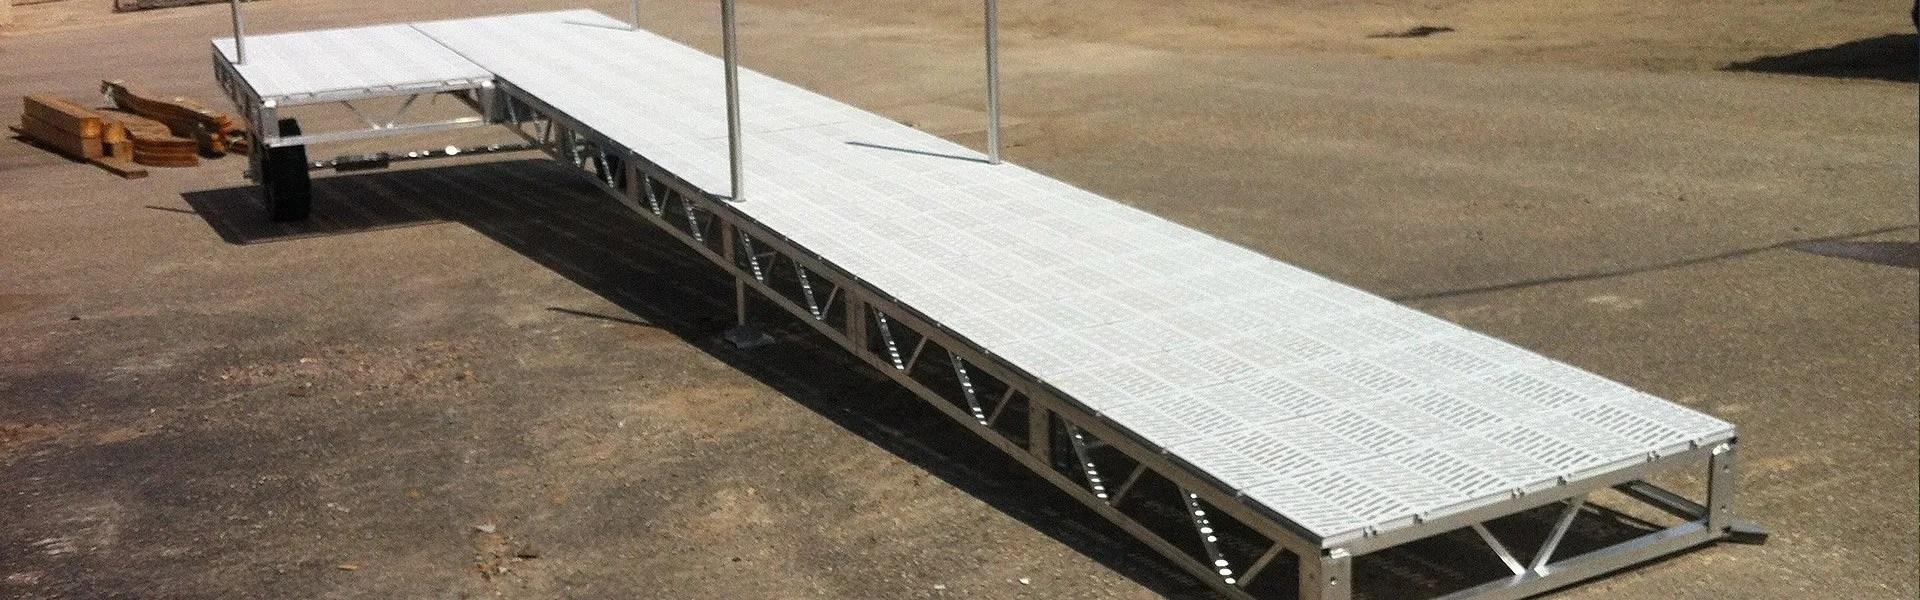 Diy kit docks ridgeline manufacturing creating high quality diy kit docks solutioingenieria Image collections